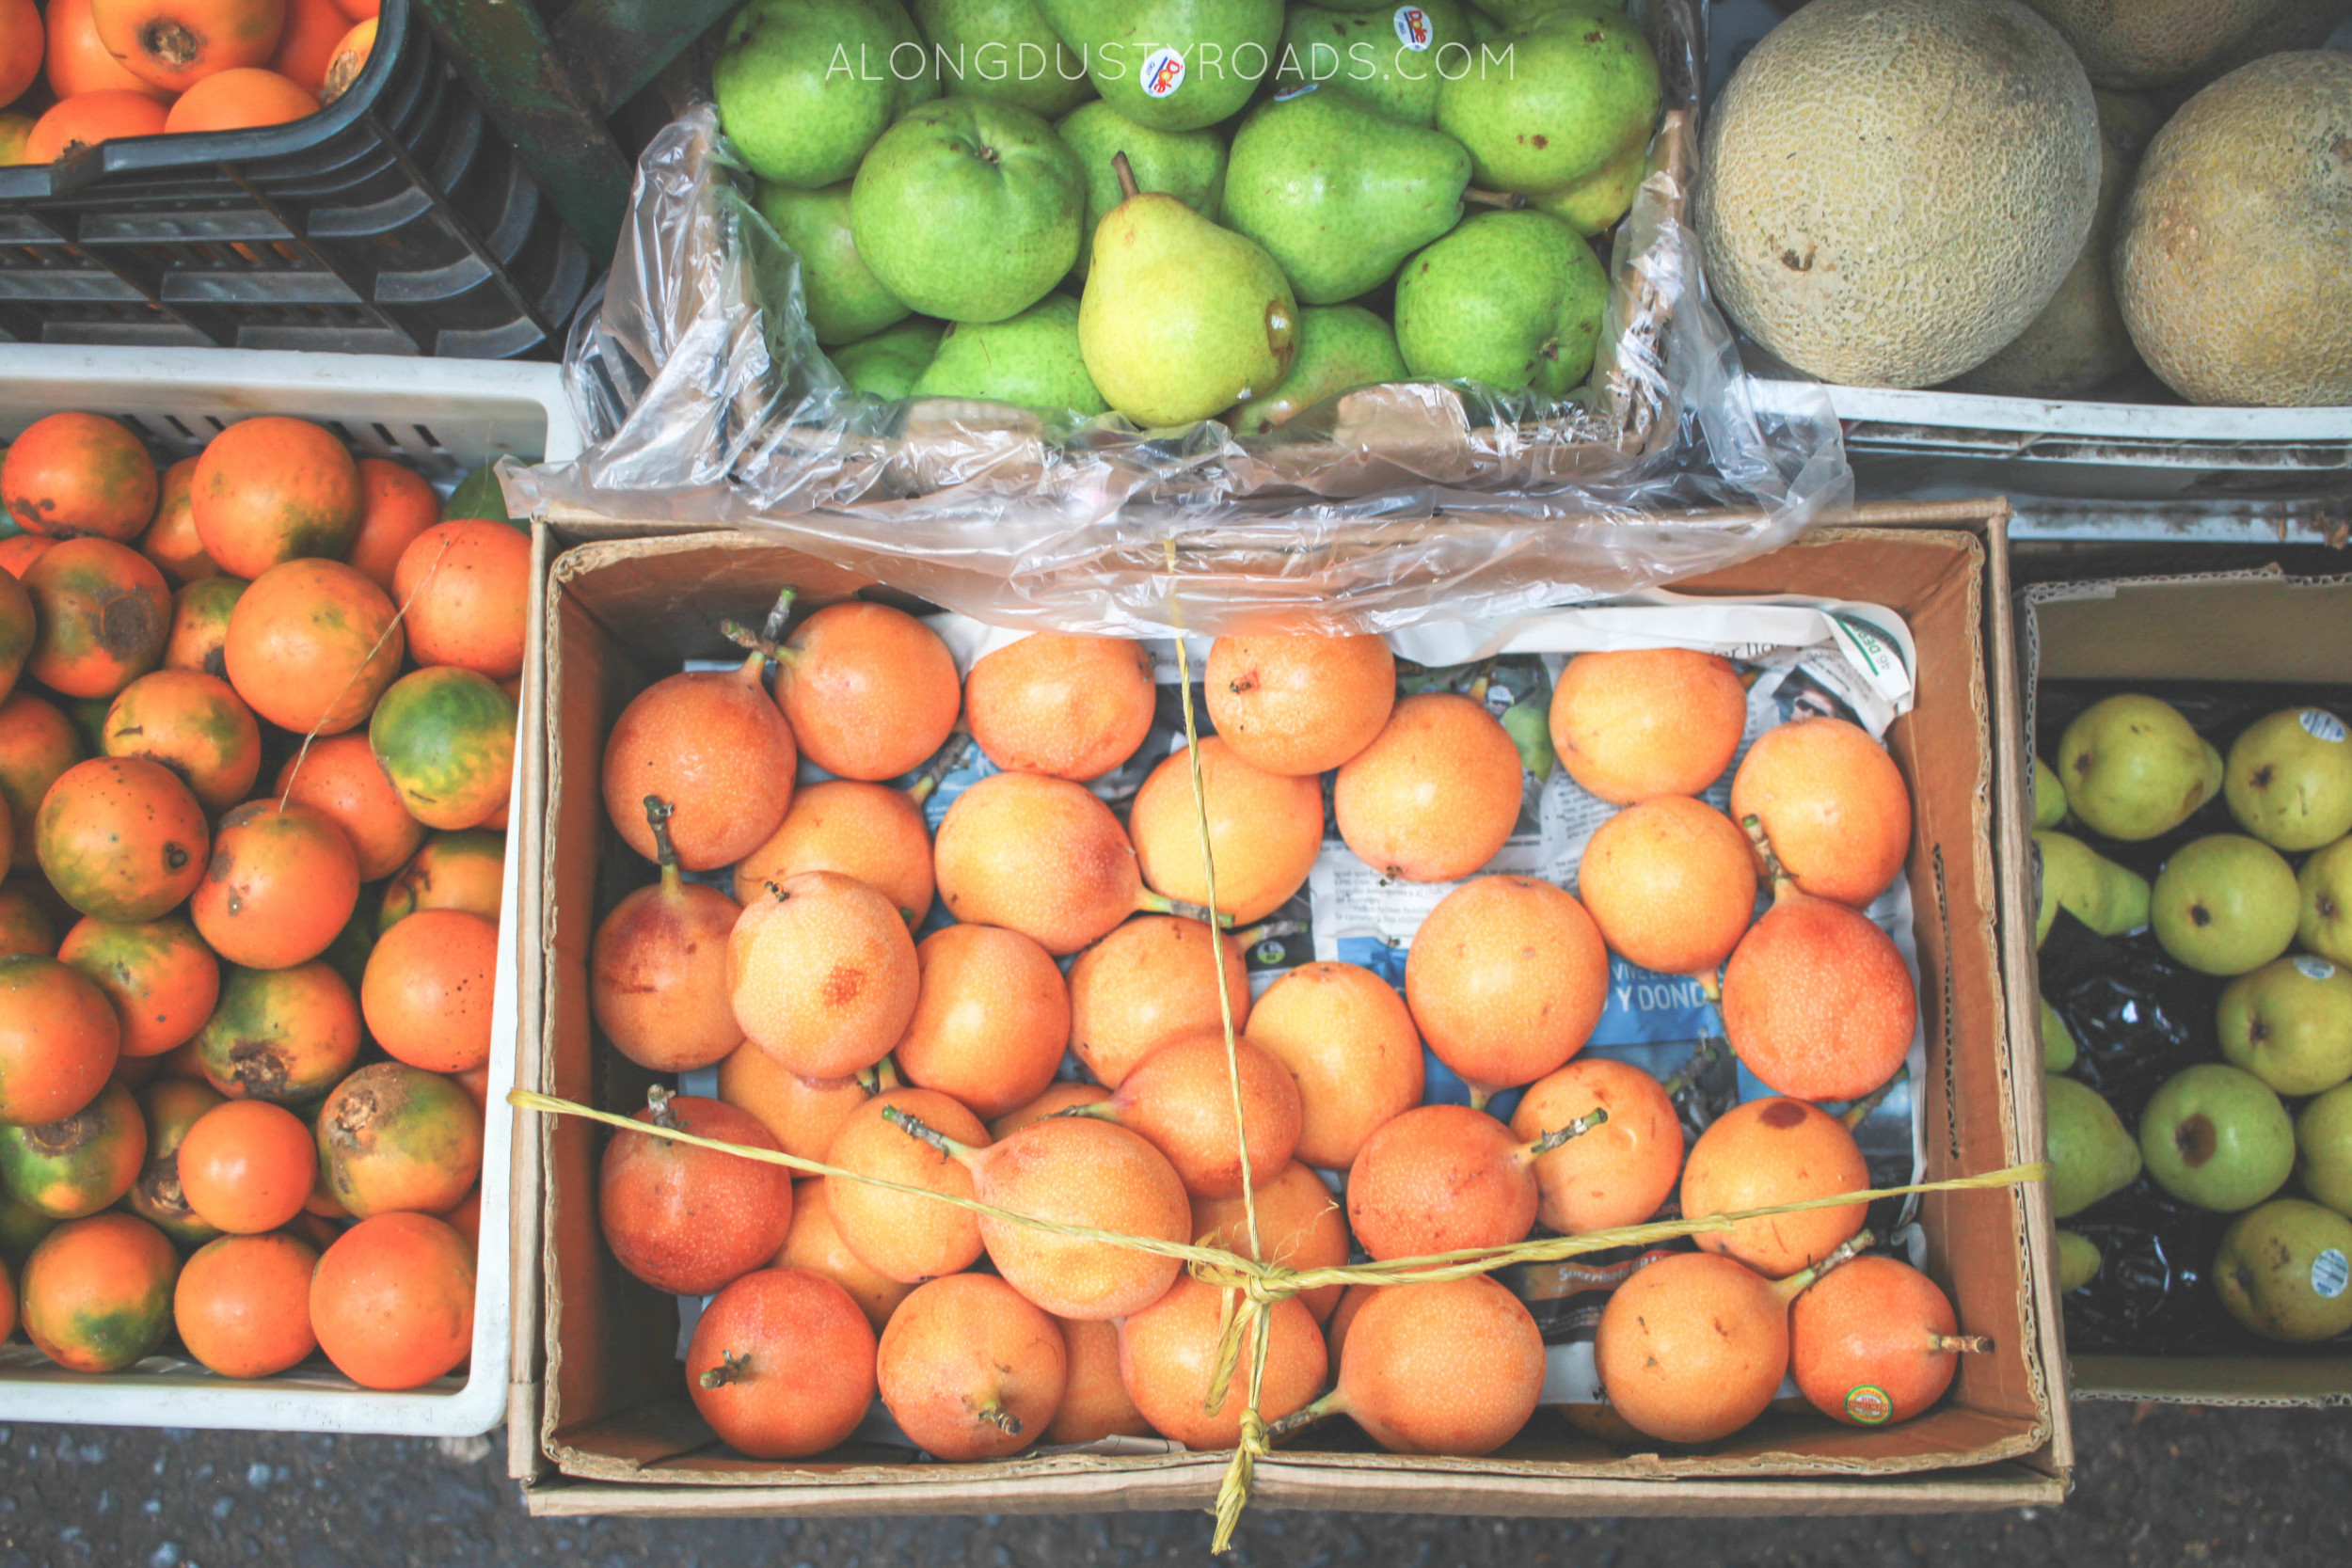 boxes of fruit minorista market